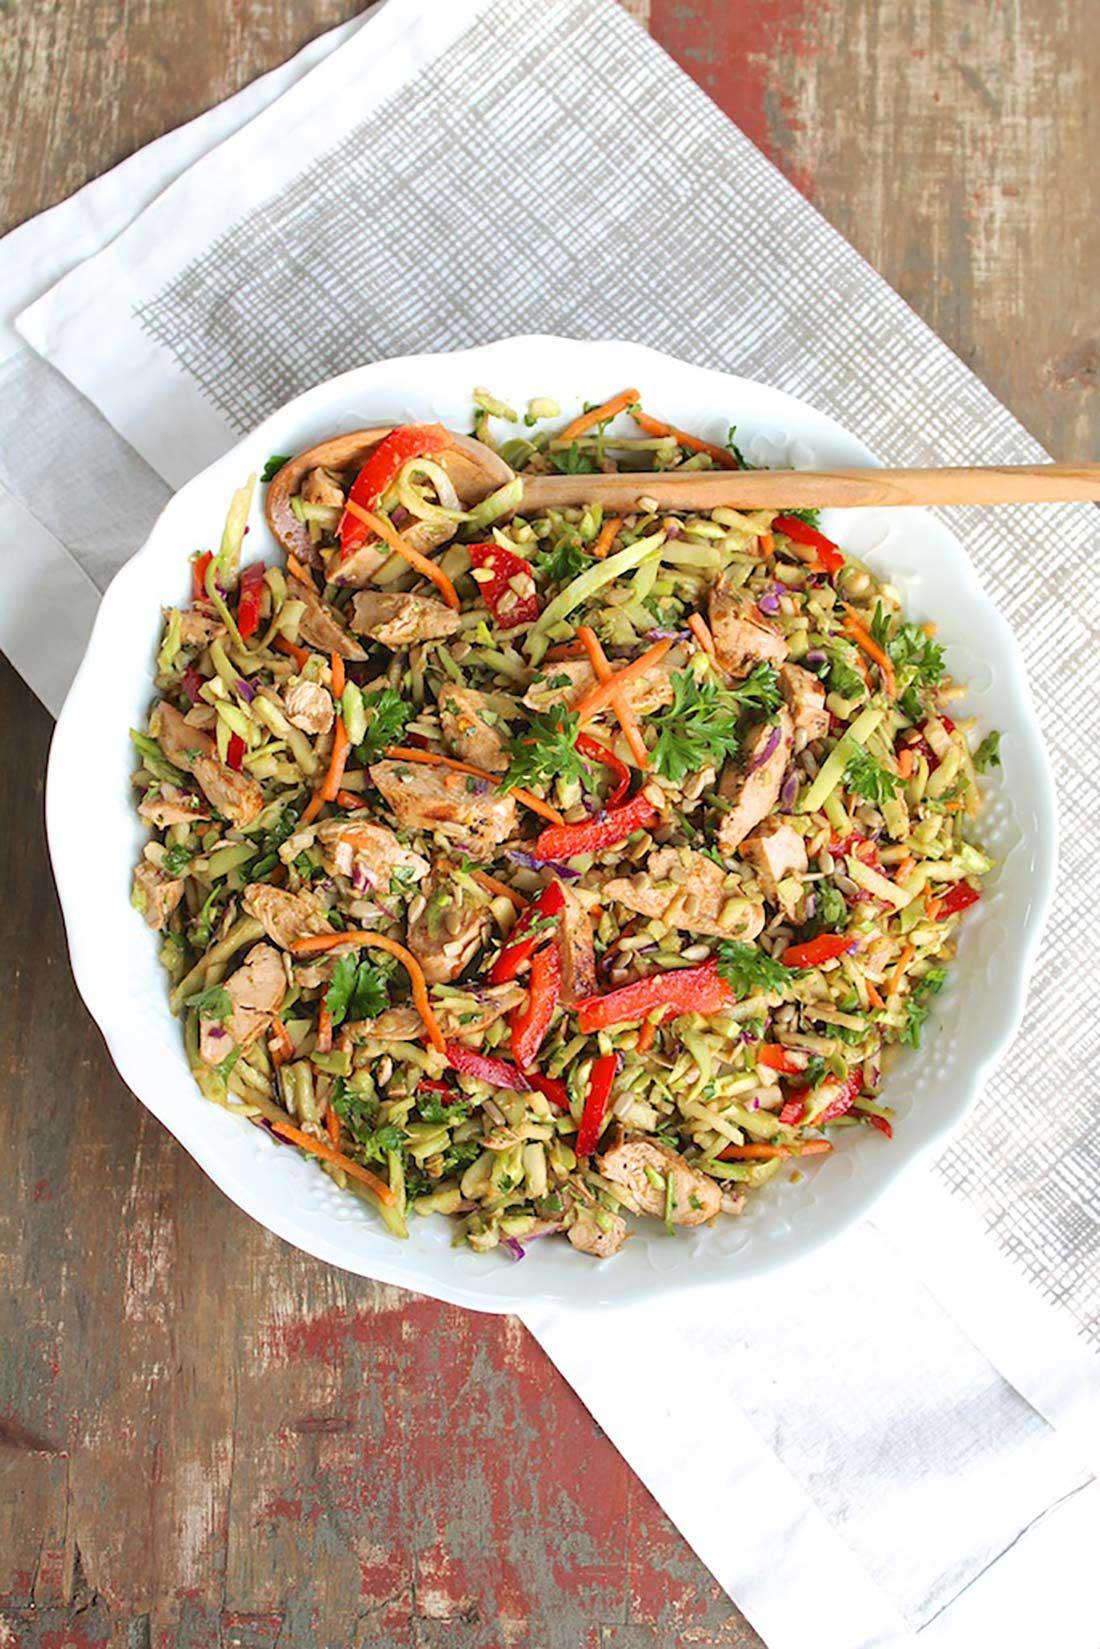 Chicken & Broccoli Slaw with Speedy Thai Peanut Sauce